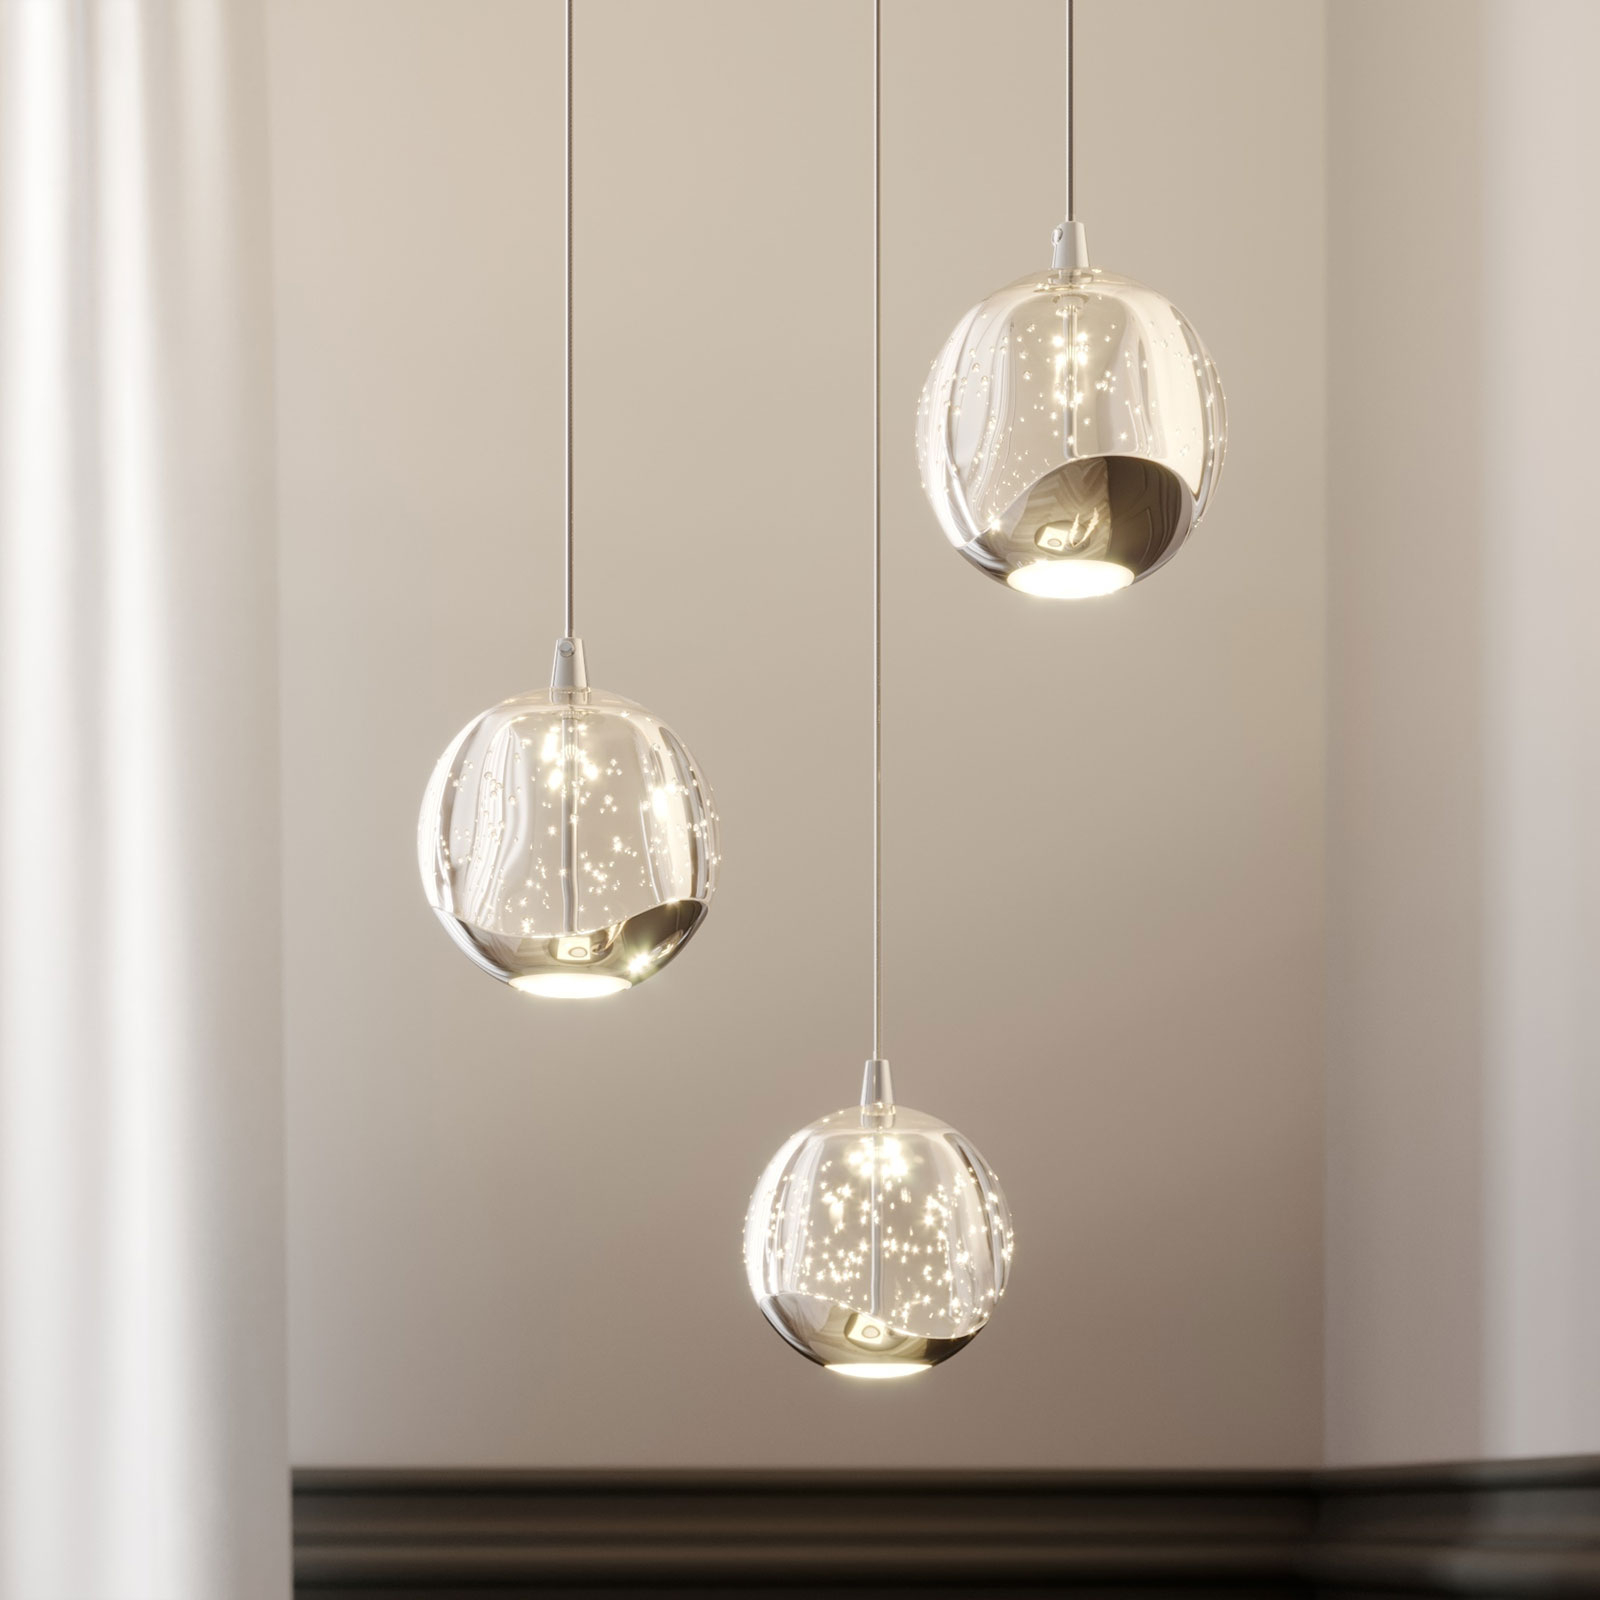 LED-pendellampe Hayley, 3 lyskilder, krom